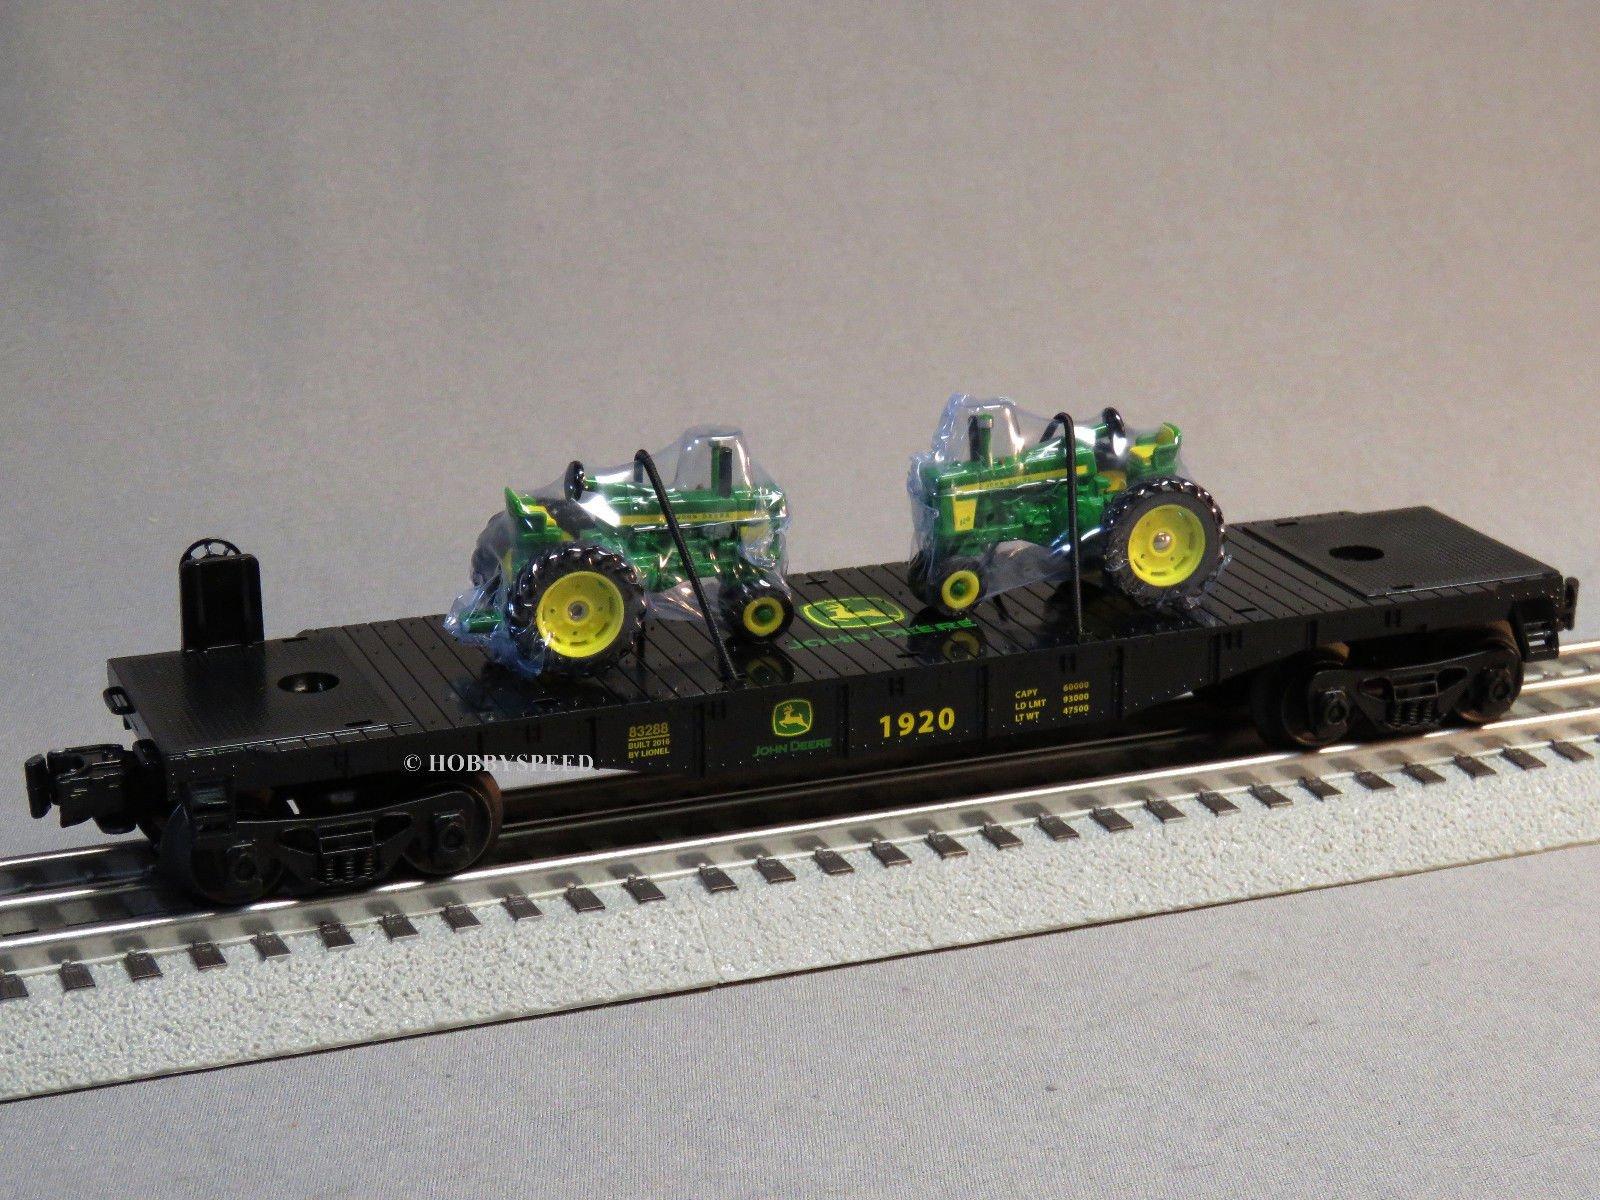 LIONEL JOHN DEERE FLATCAR 2 FARM TRACTORS 1:64 o gauge train 6-83286